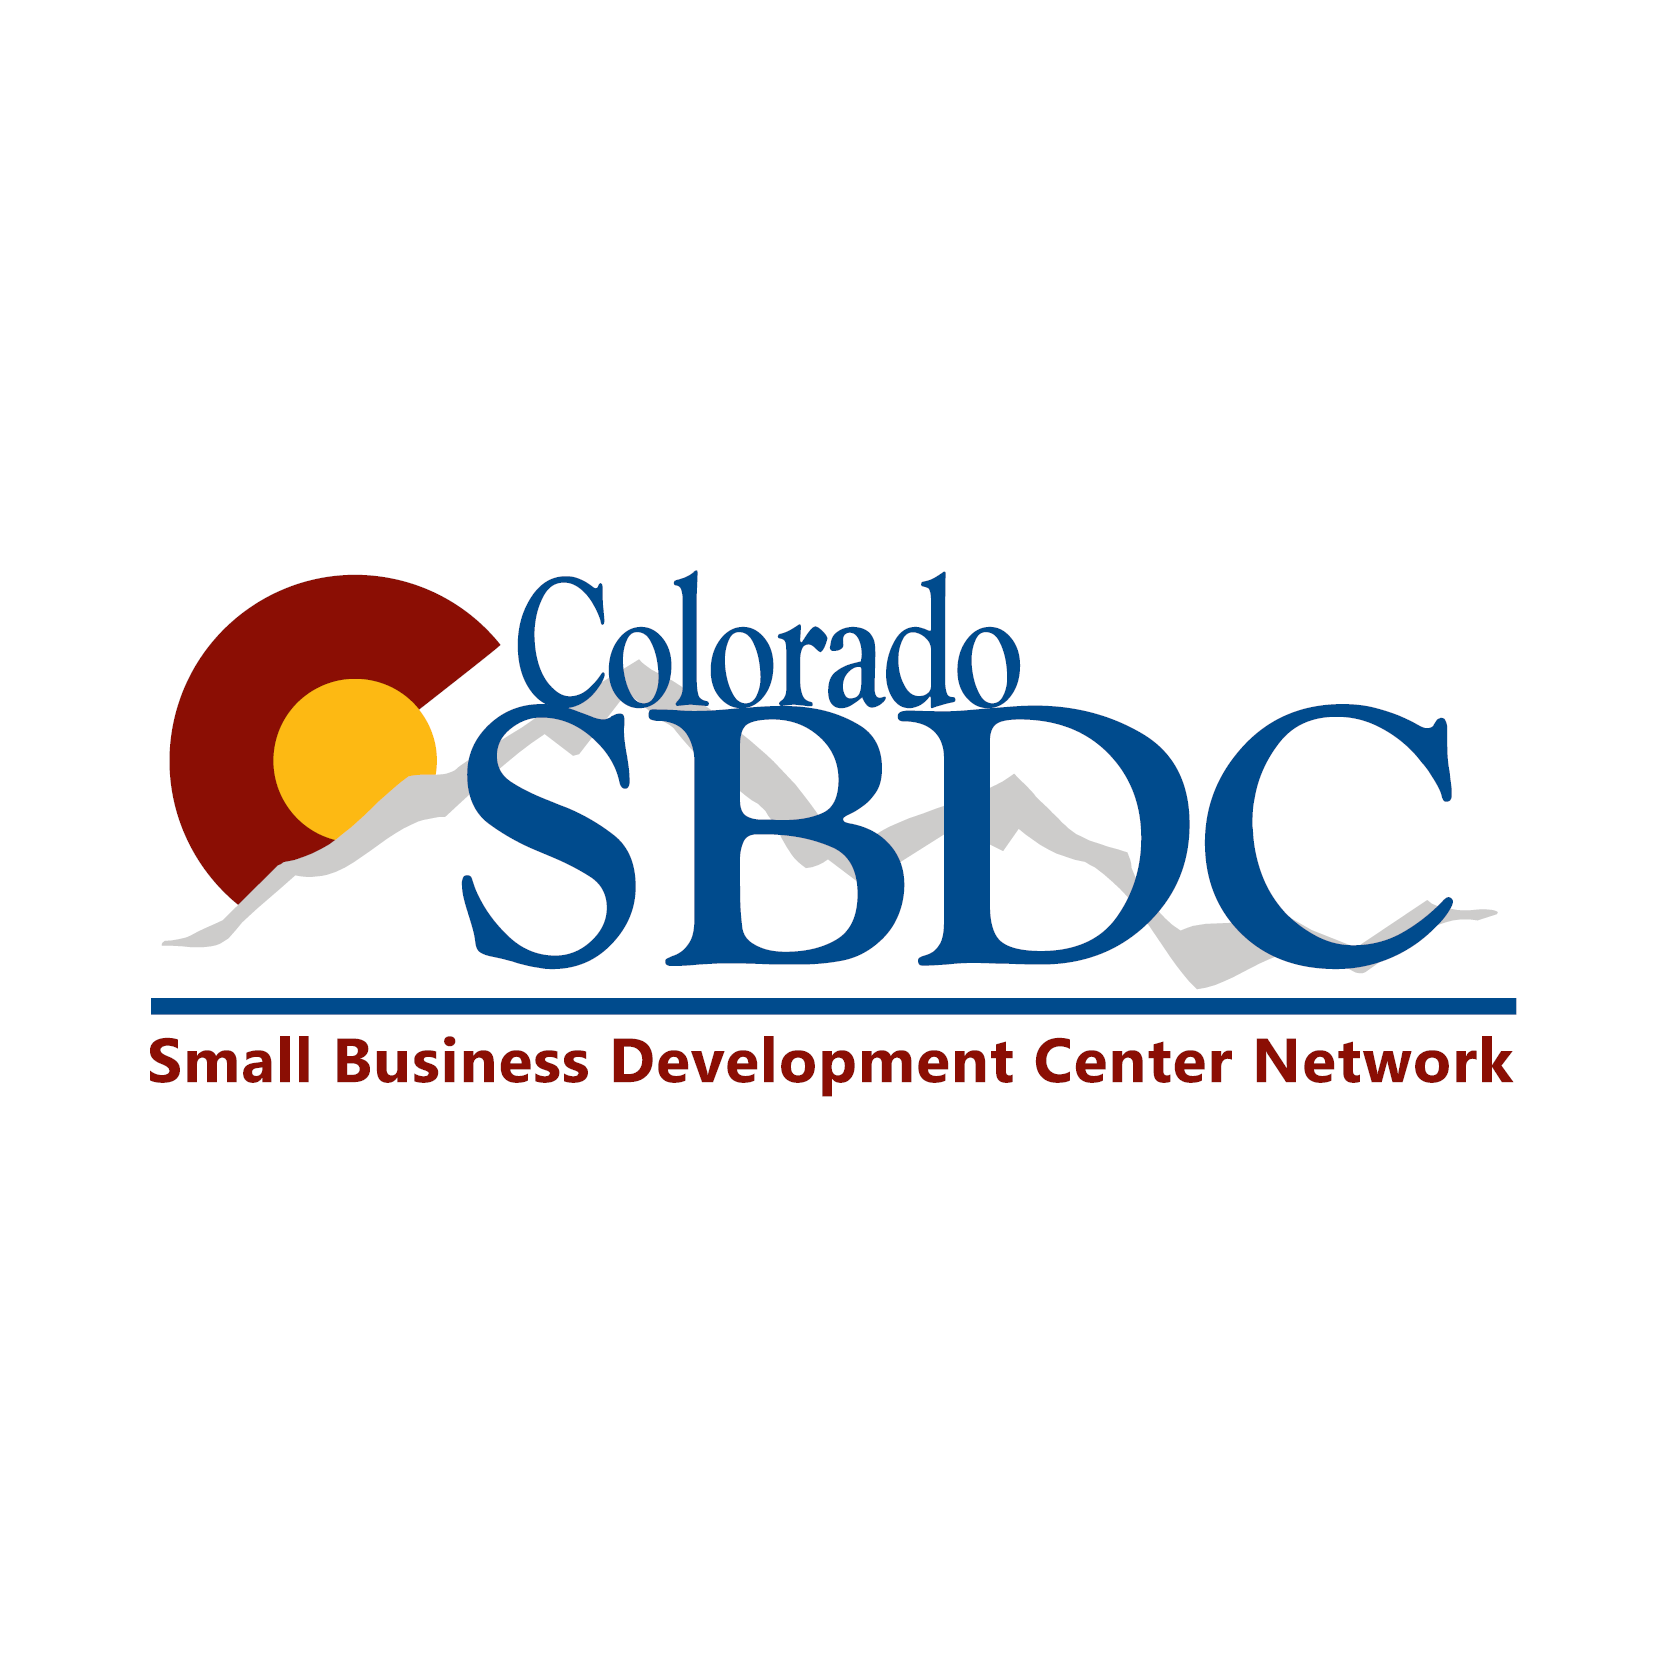 Events - Colorado Small Business Development Center Network